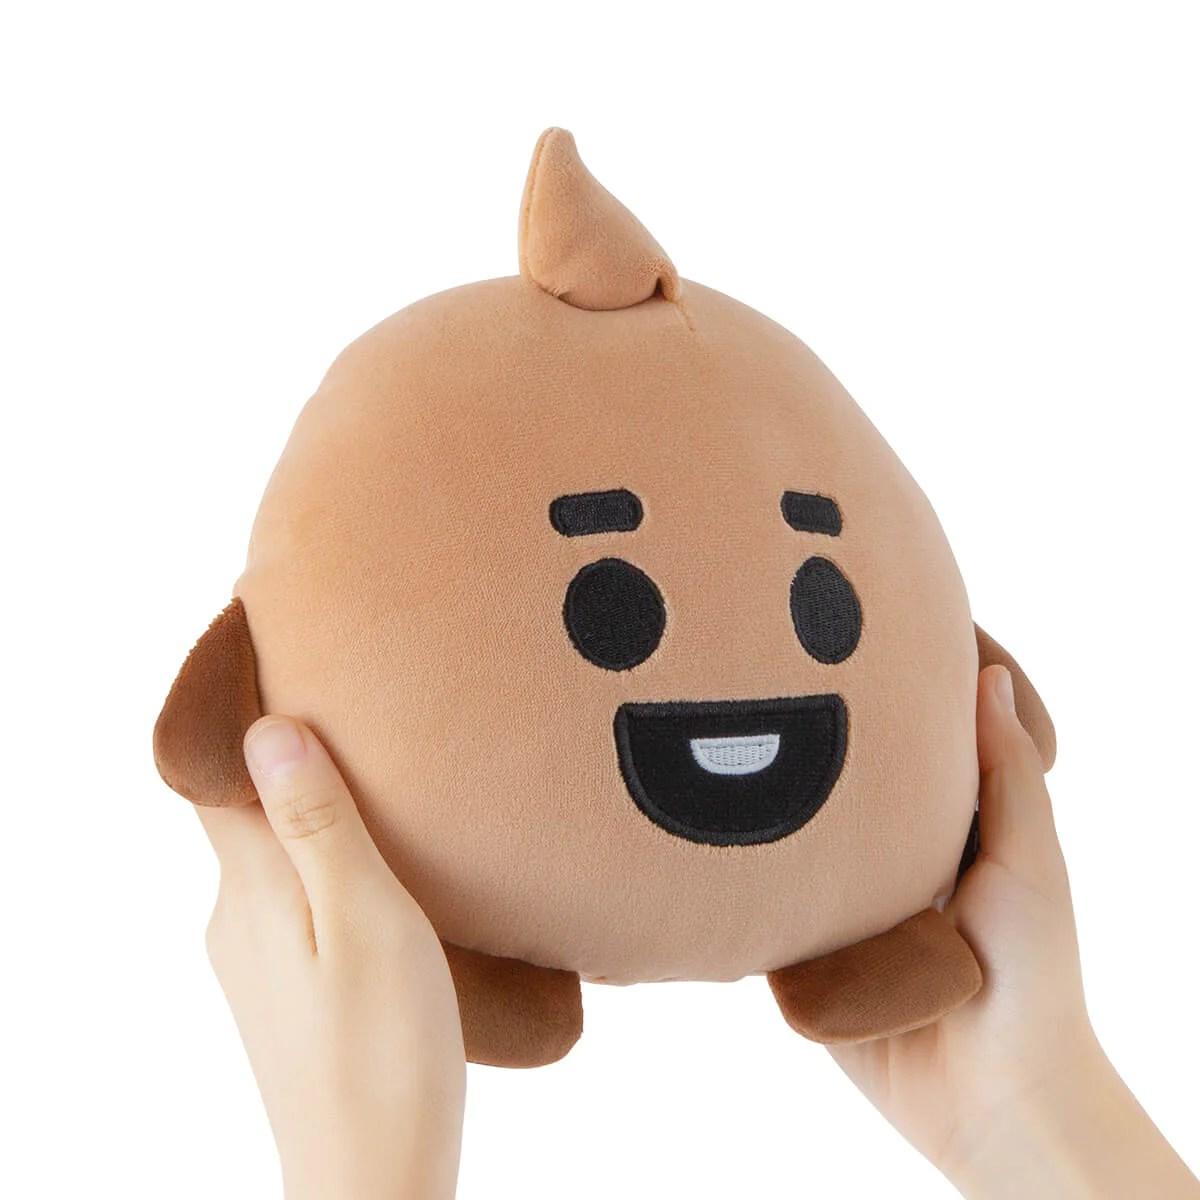 bt21 shooky baby mini body cushion